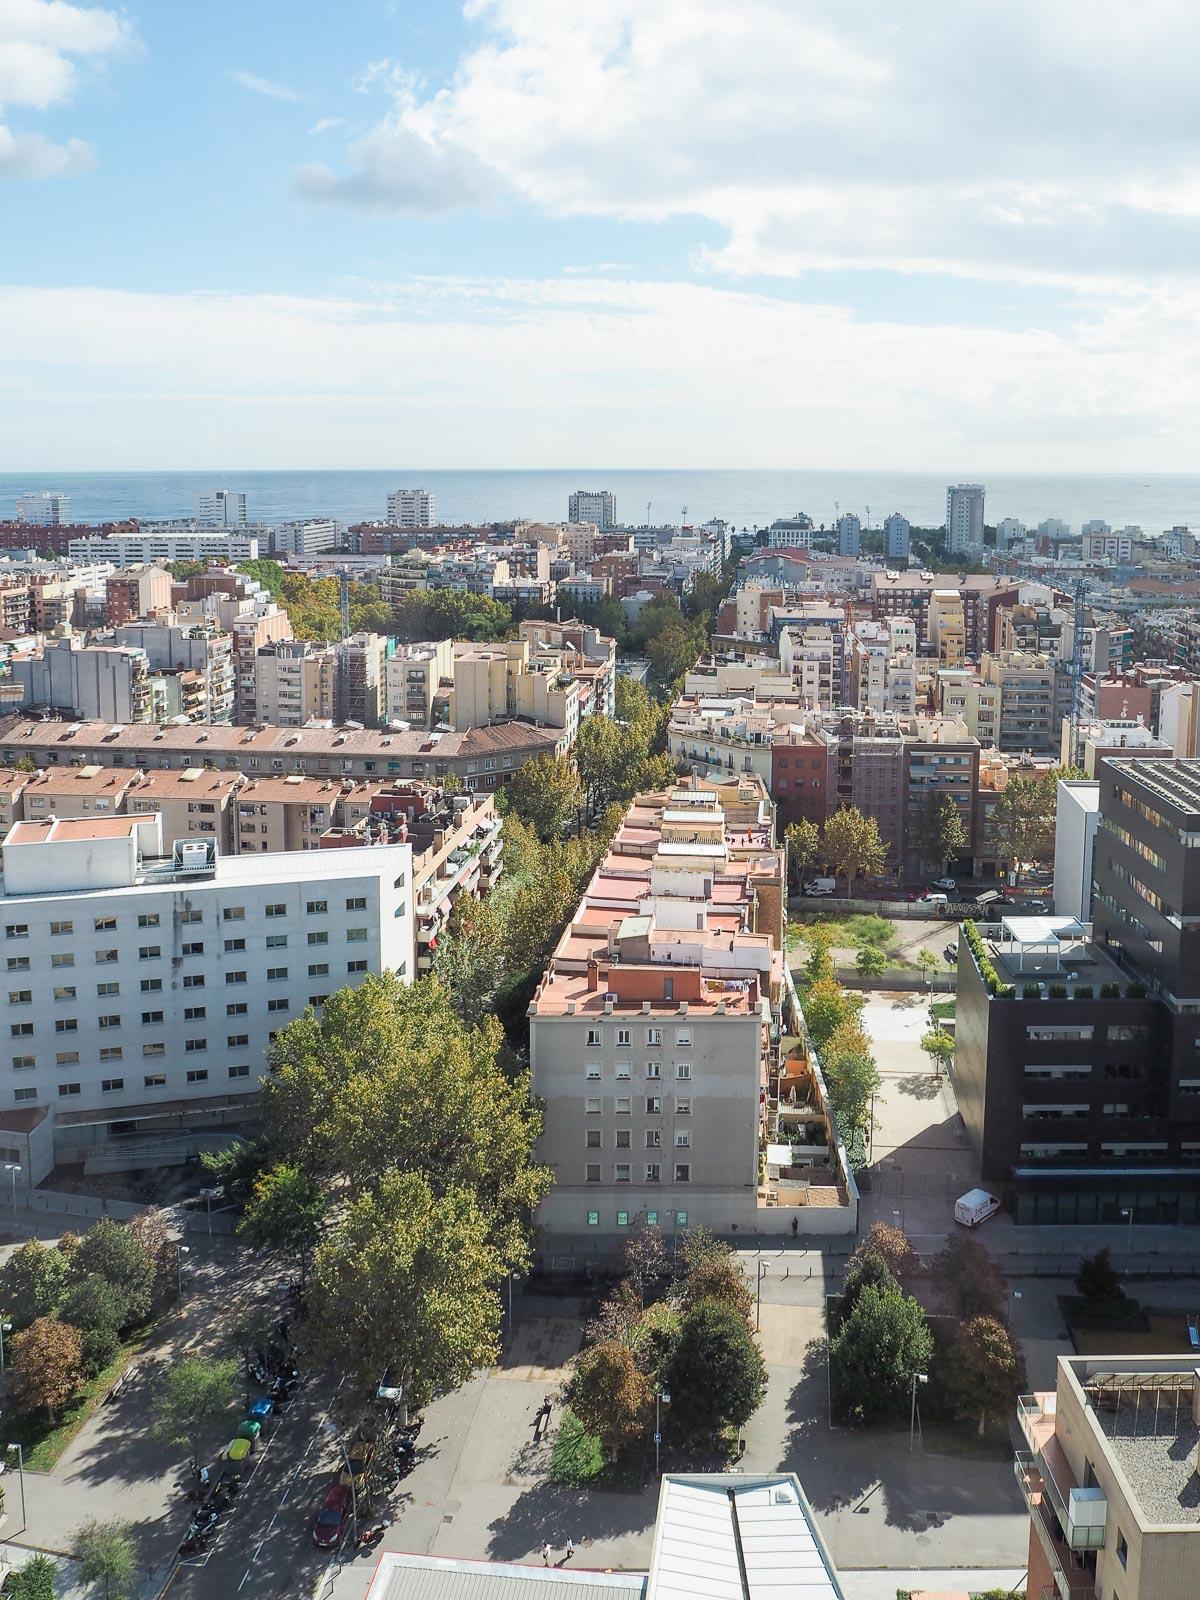 Melia, Melia Barcelona Sky, Barcelona Hotel, Barcelona, Hotel,